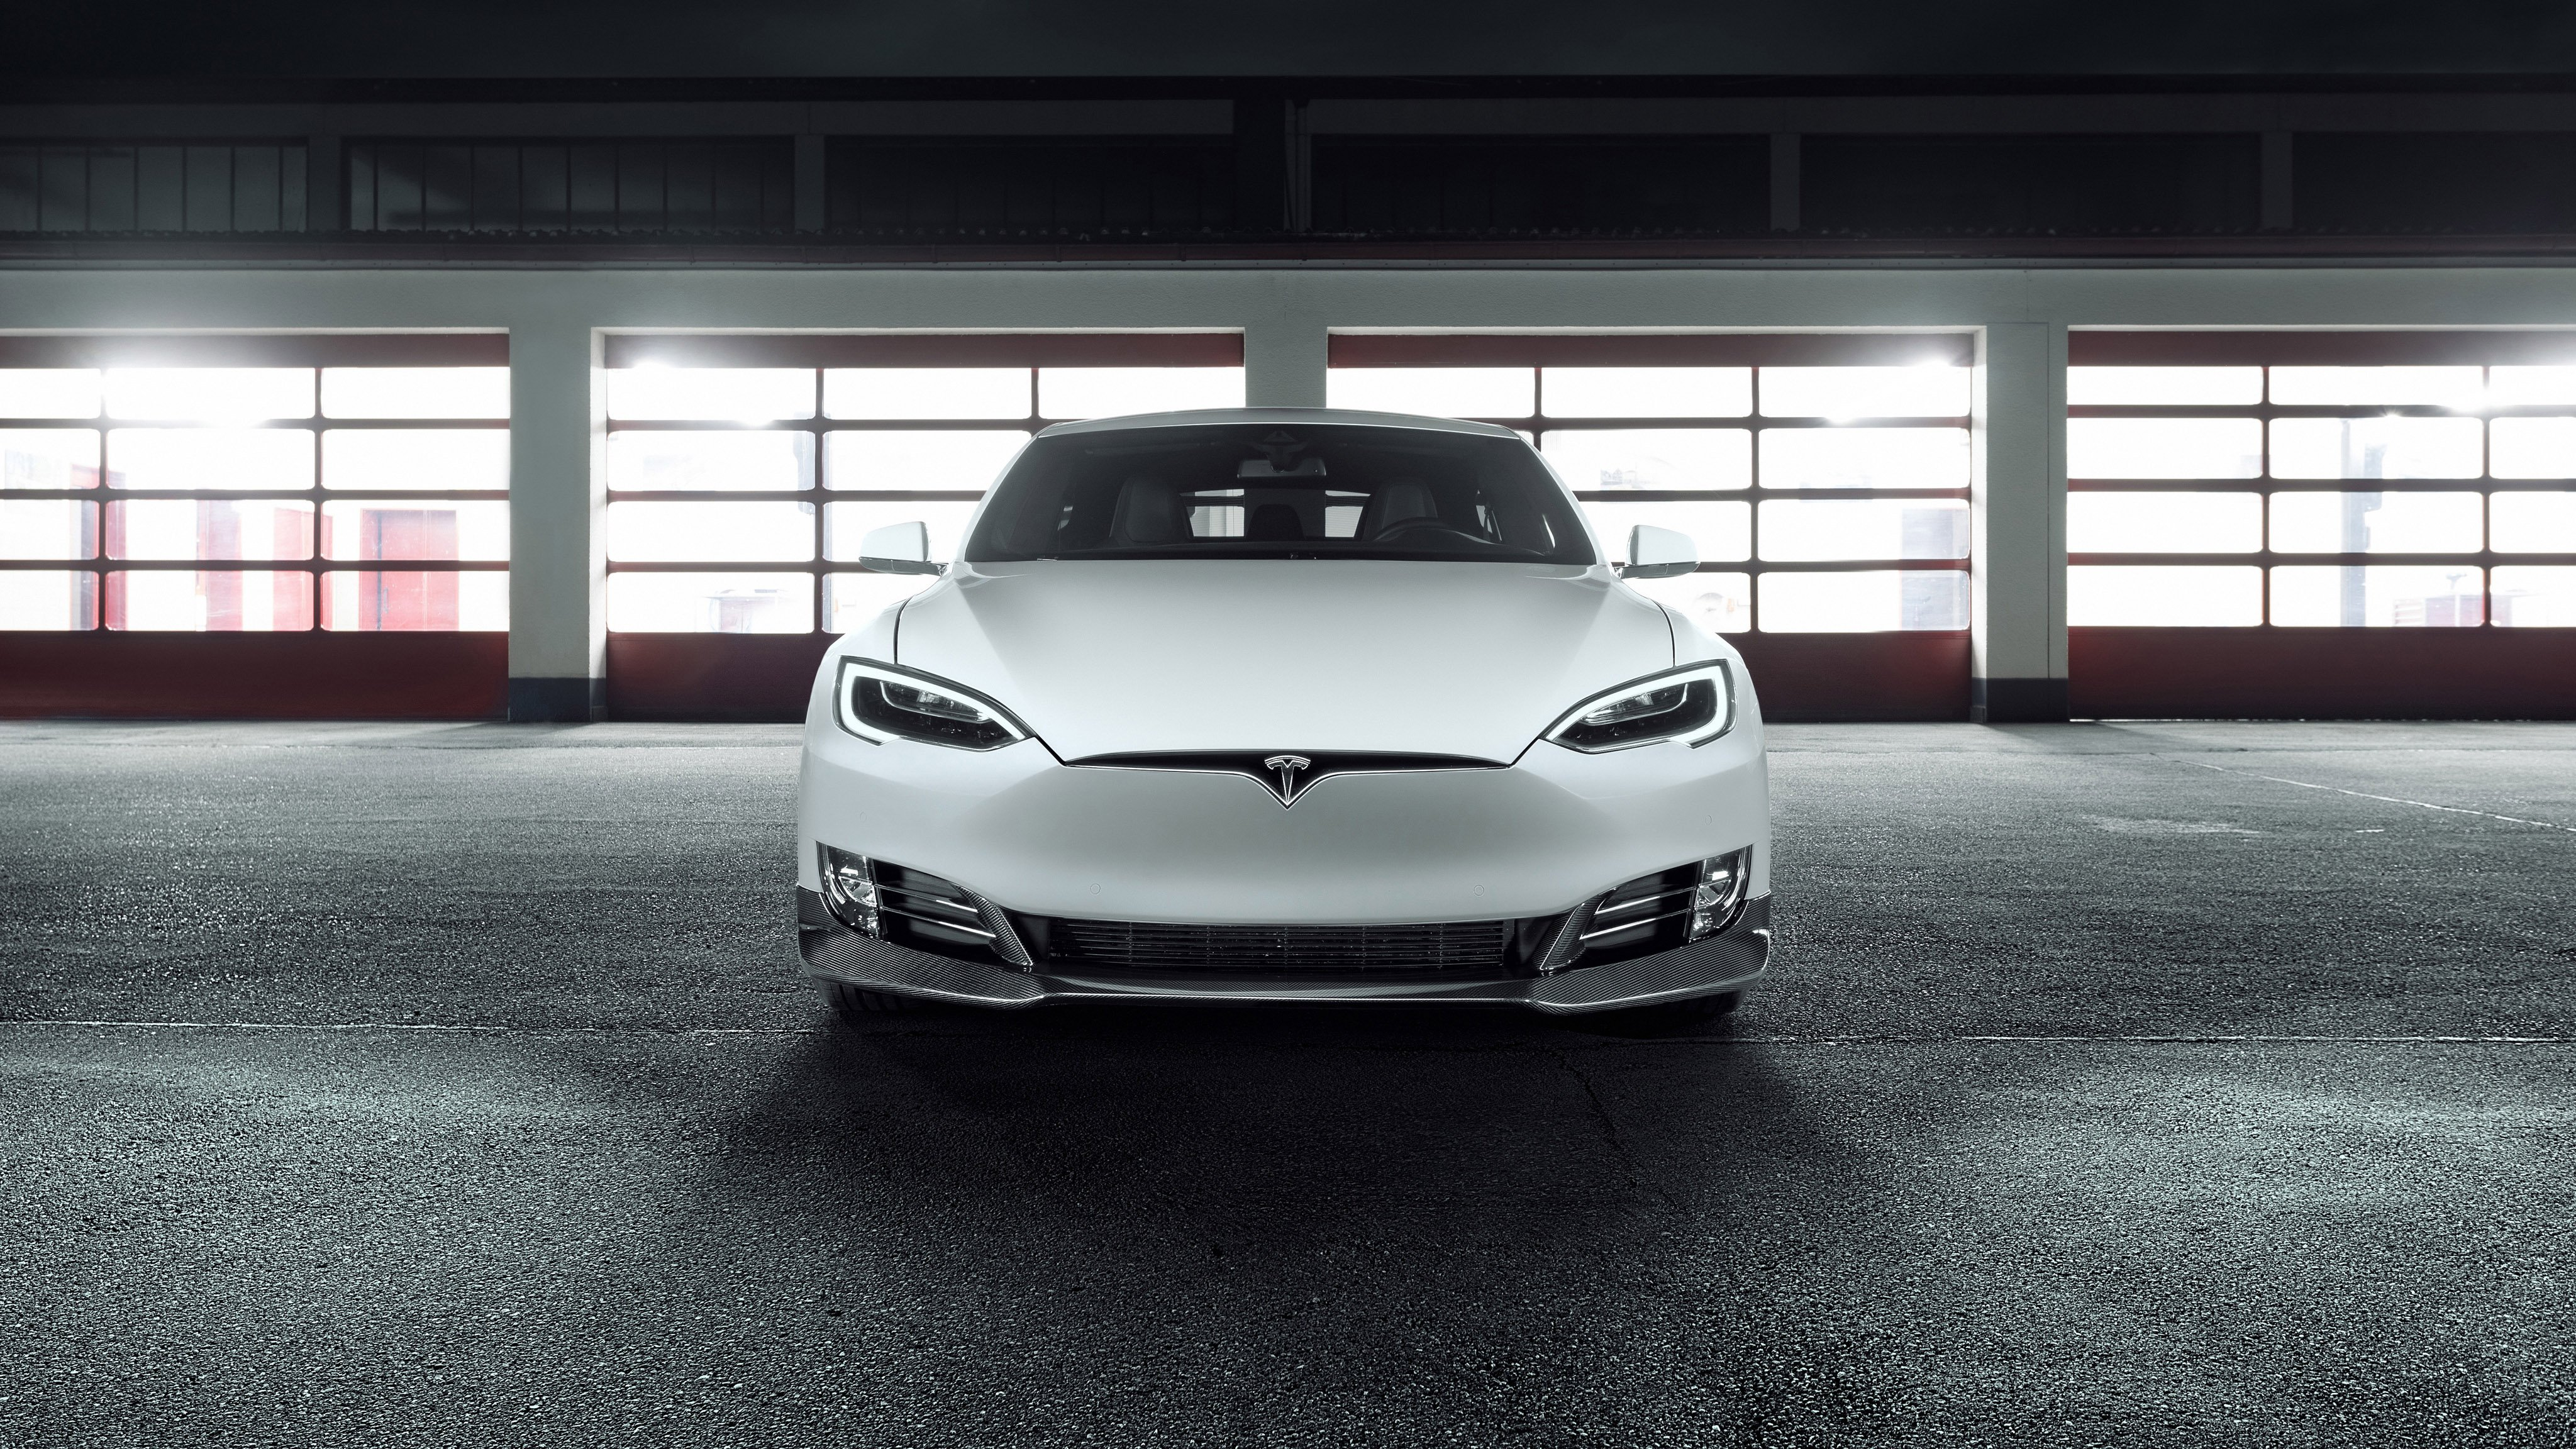 Тесла, Tesla Model S, авто, машина, 4k обои